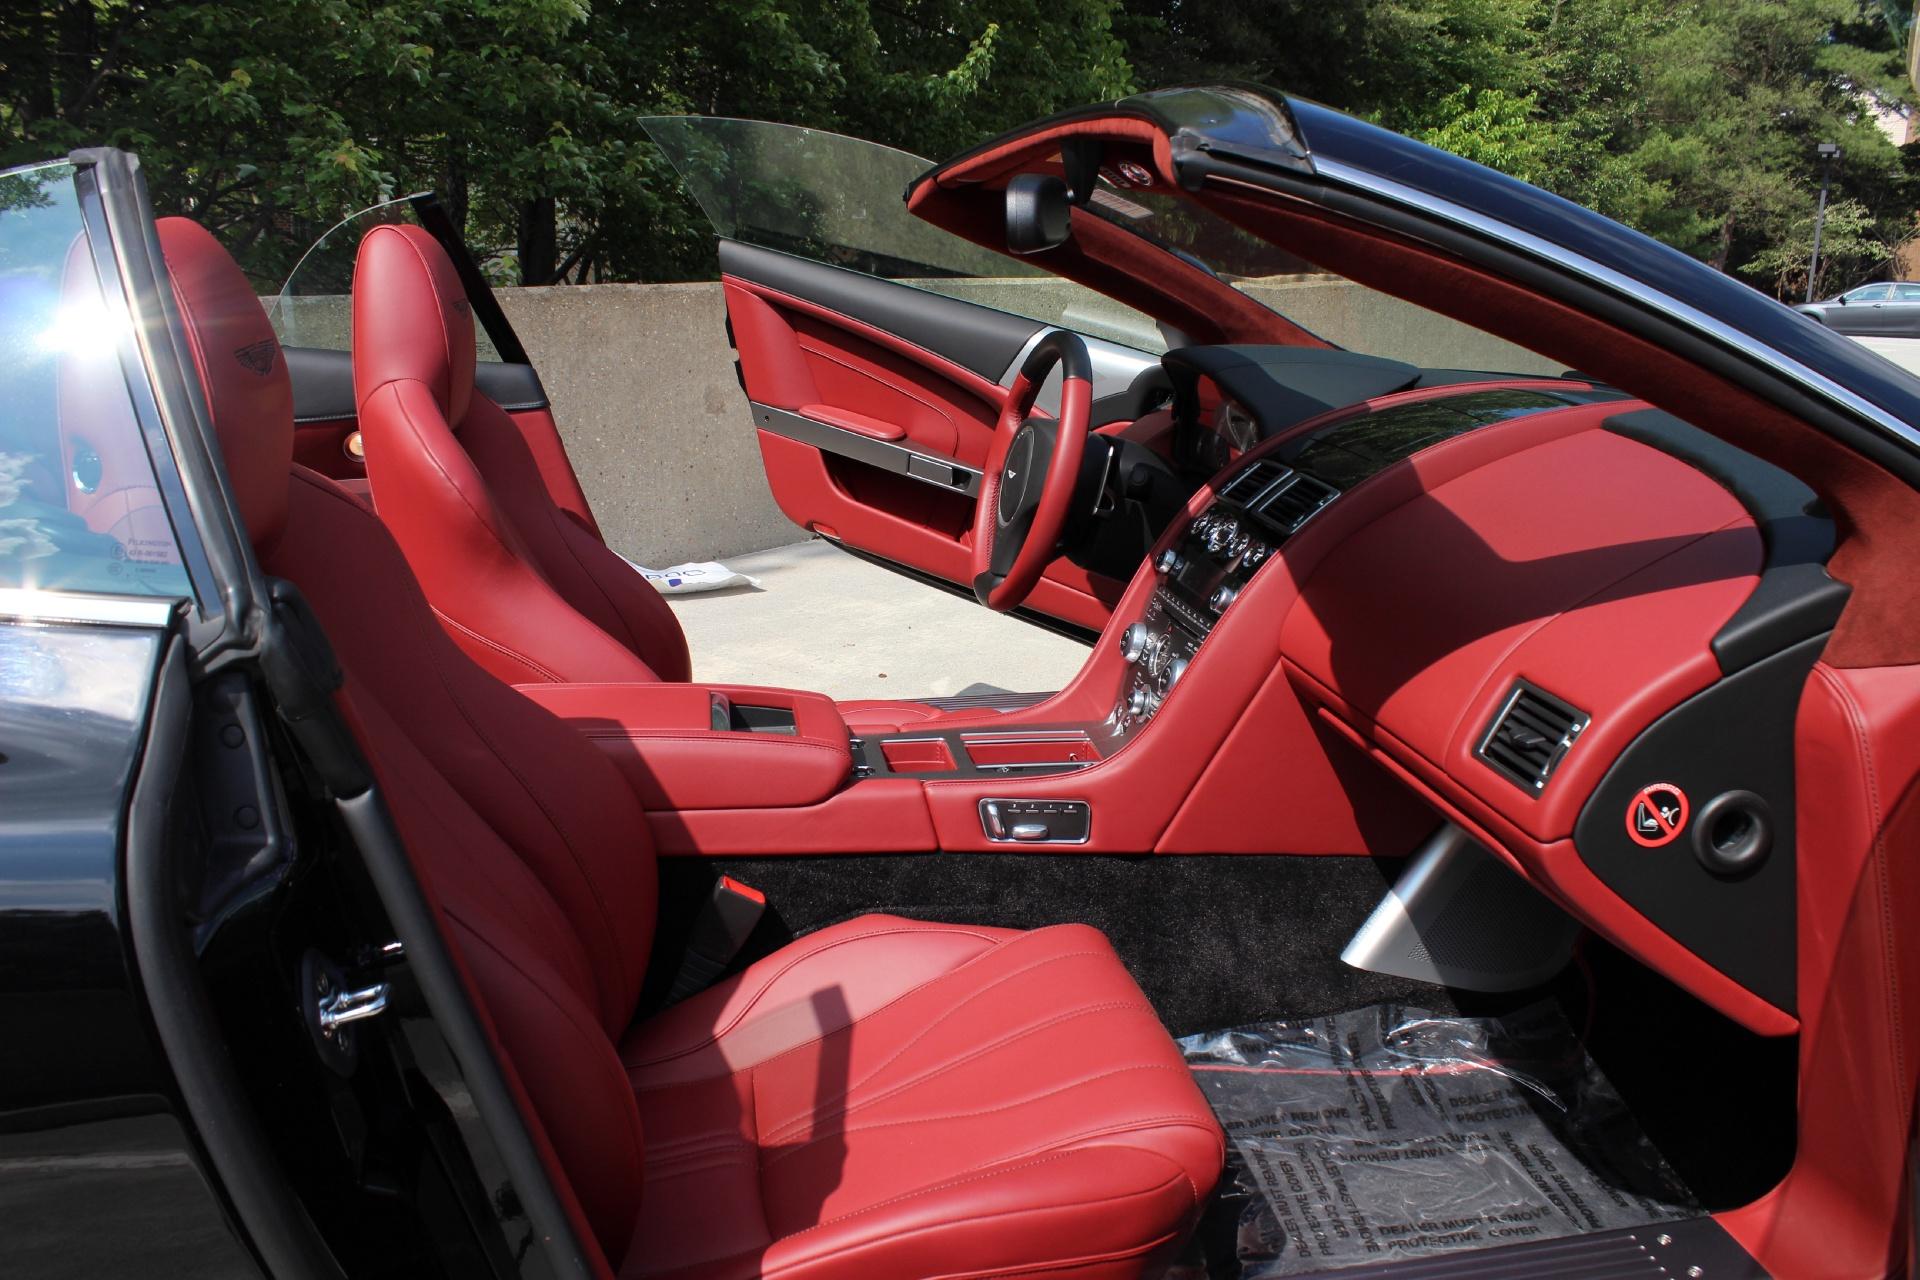 2014 Aston Martin Db9 Volante Stock 4nb15042 For Sale Near Vienna Va Va Aston Martin Dealer